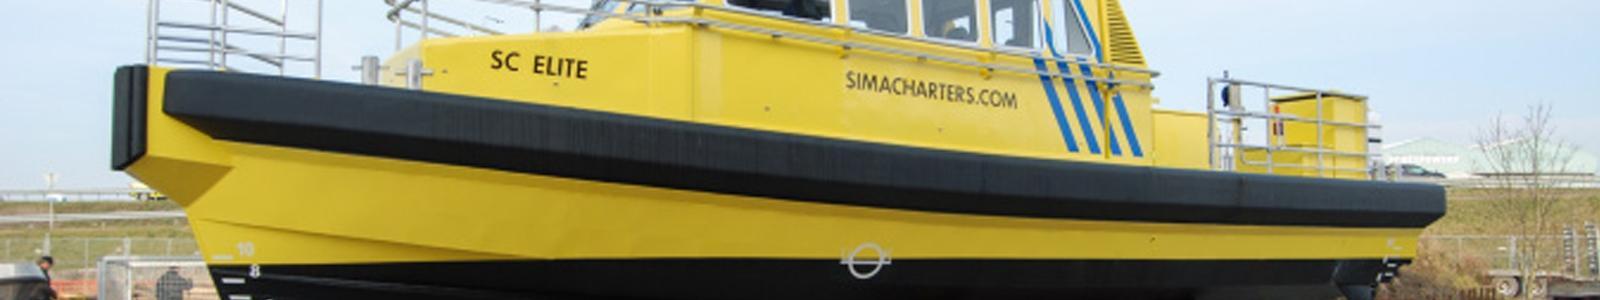 Workboat fenders Sima Charter SC Elite